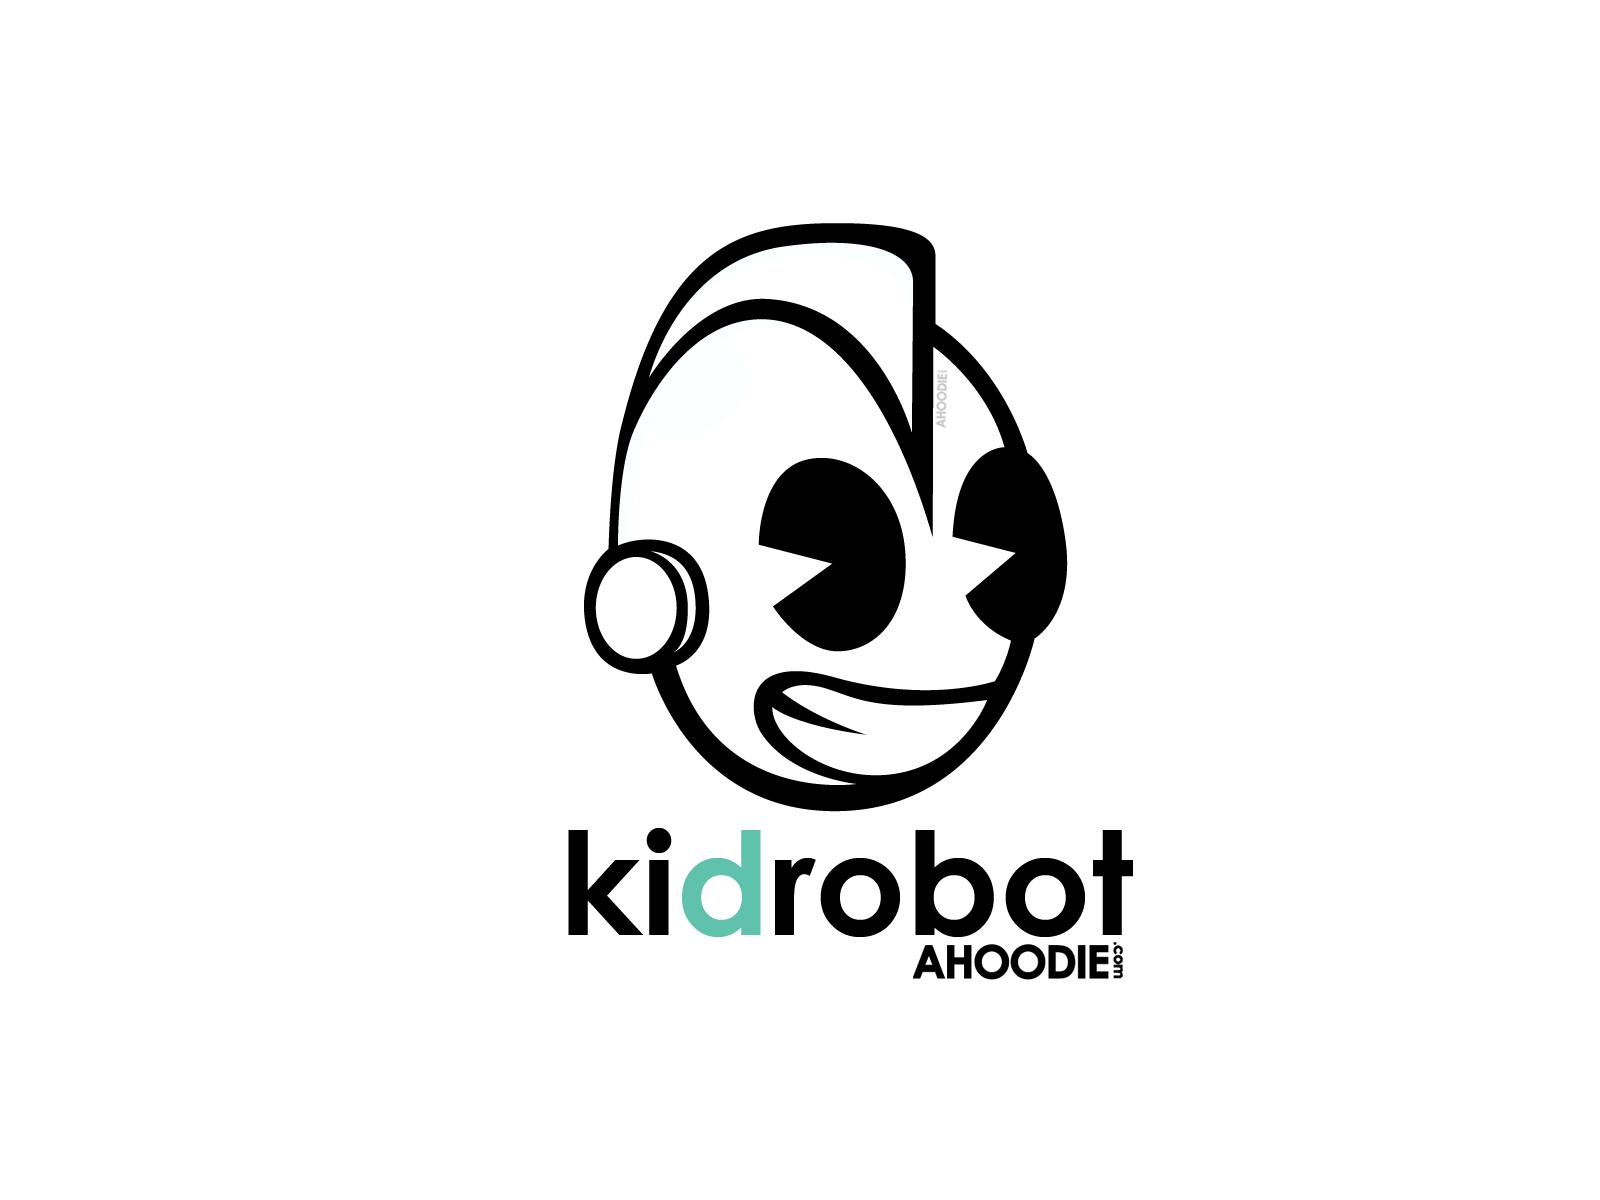 Kidrobot Logo 1600x1200